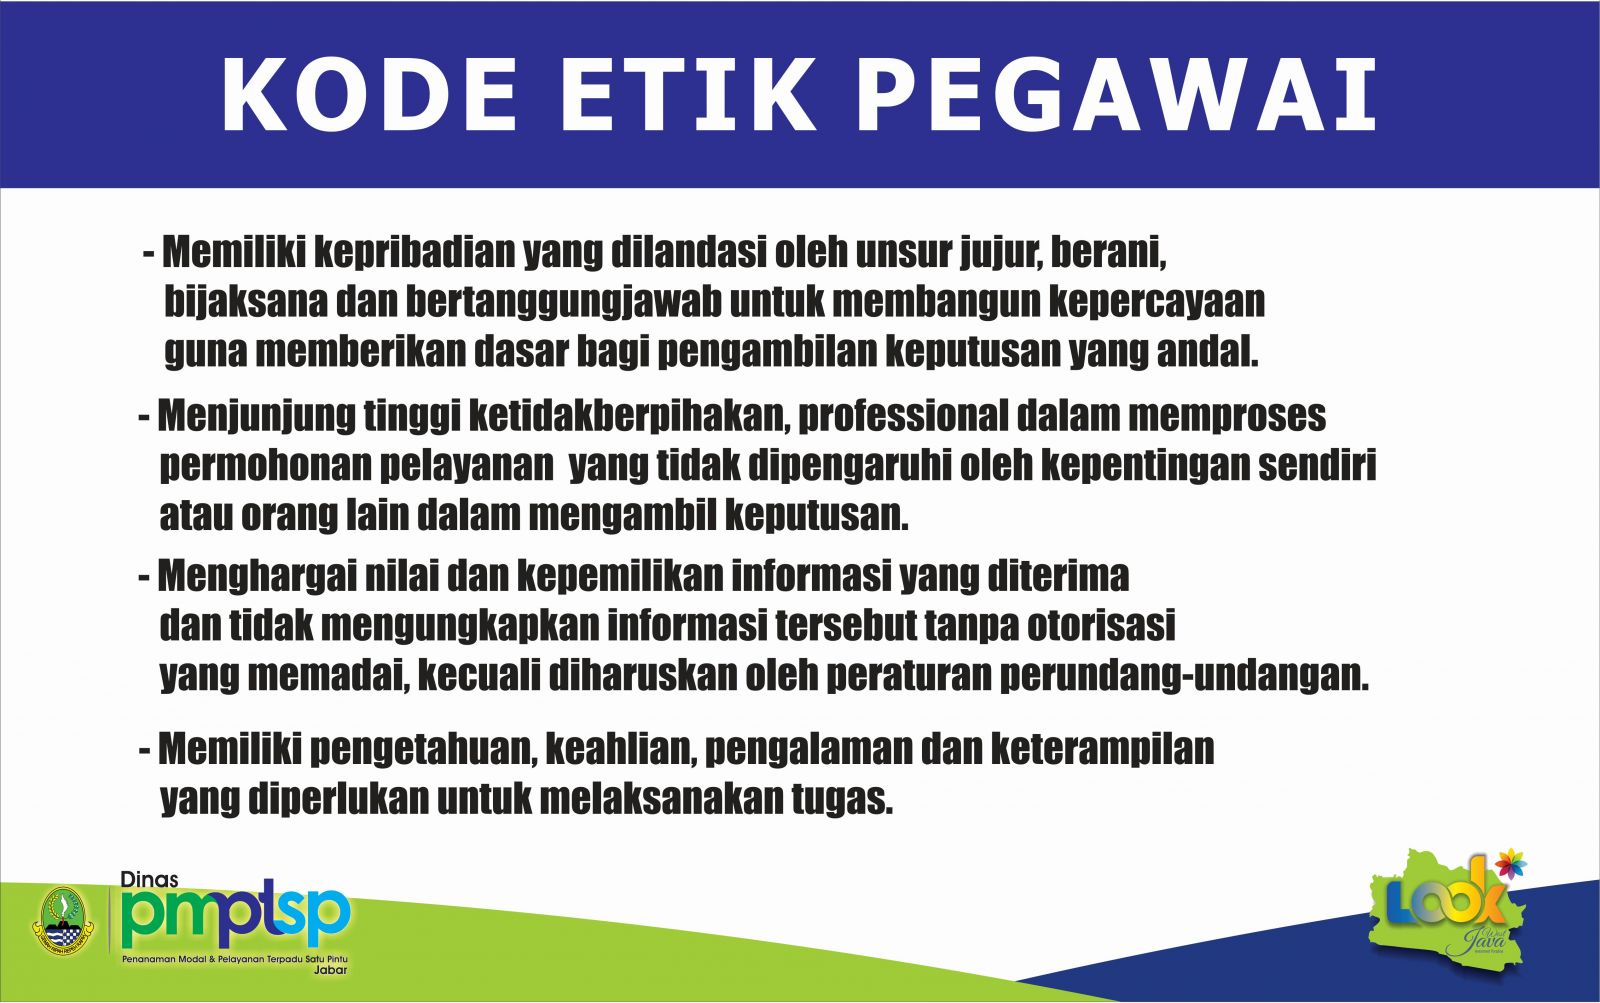 Kode Etik Pegawai